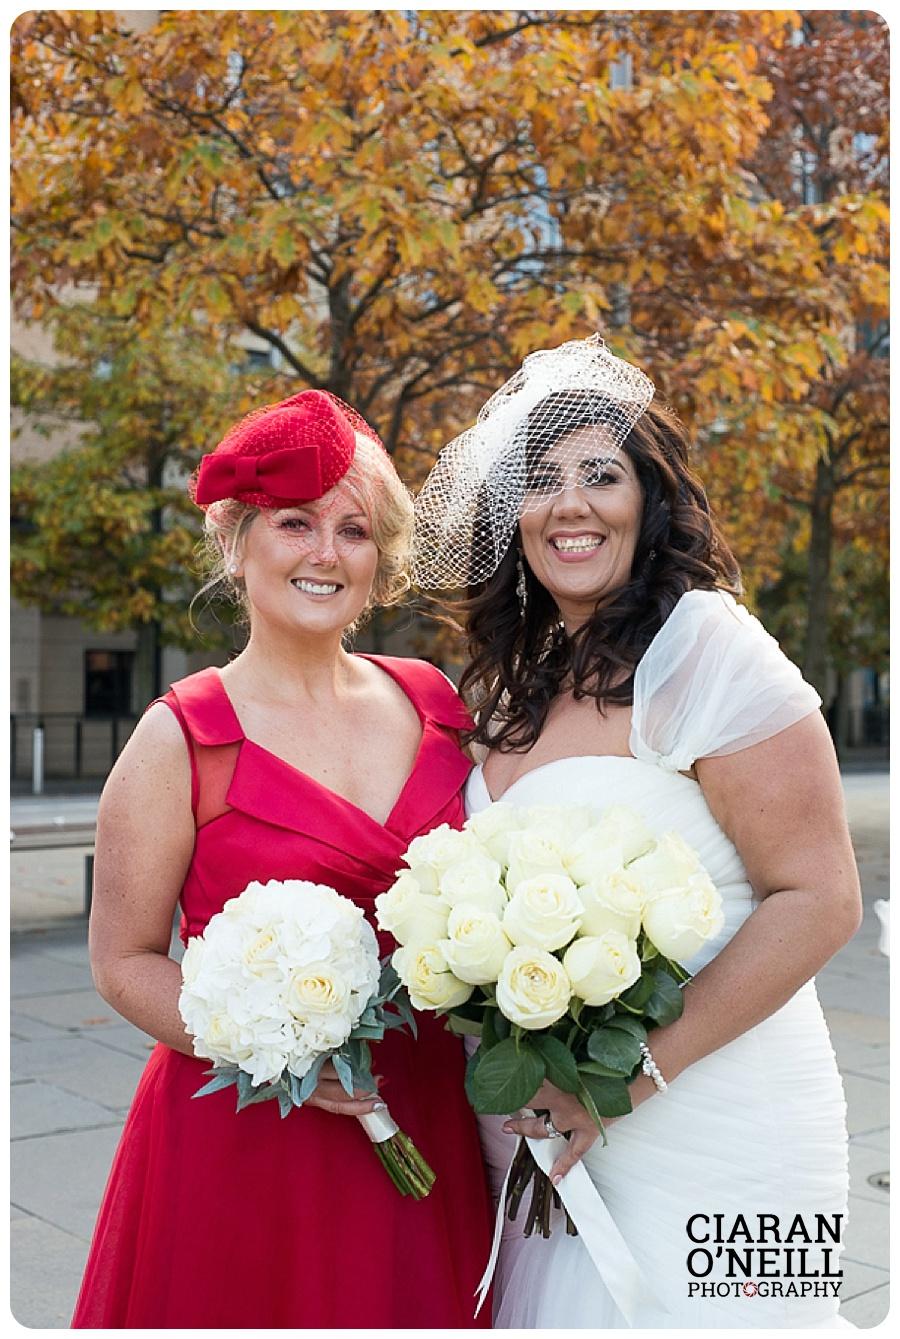 tara-sean-pols-wedding-at-ramada-plaza-belfast-by-ciaran-oneill-photography-13